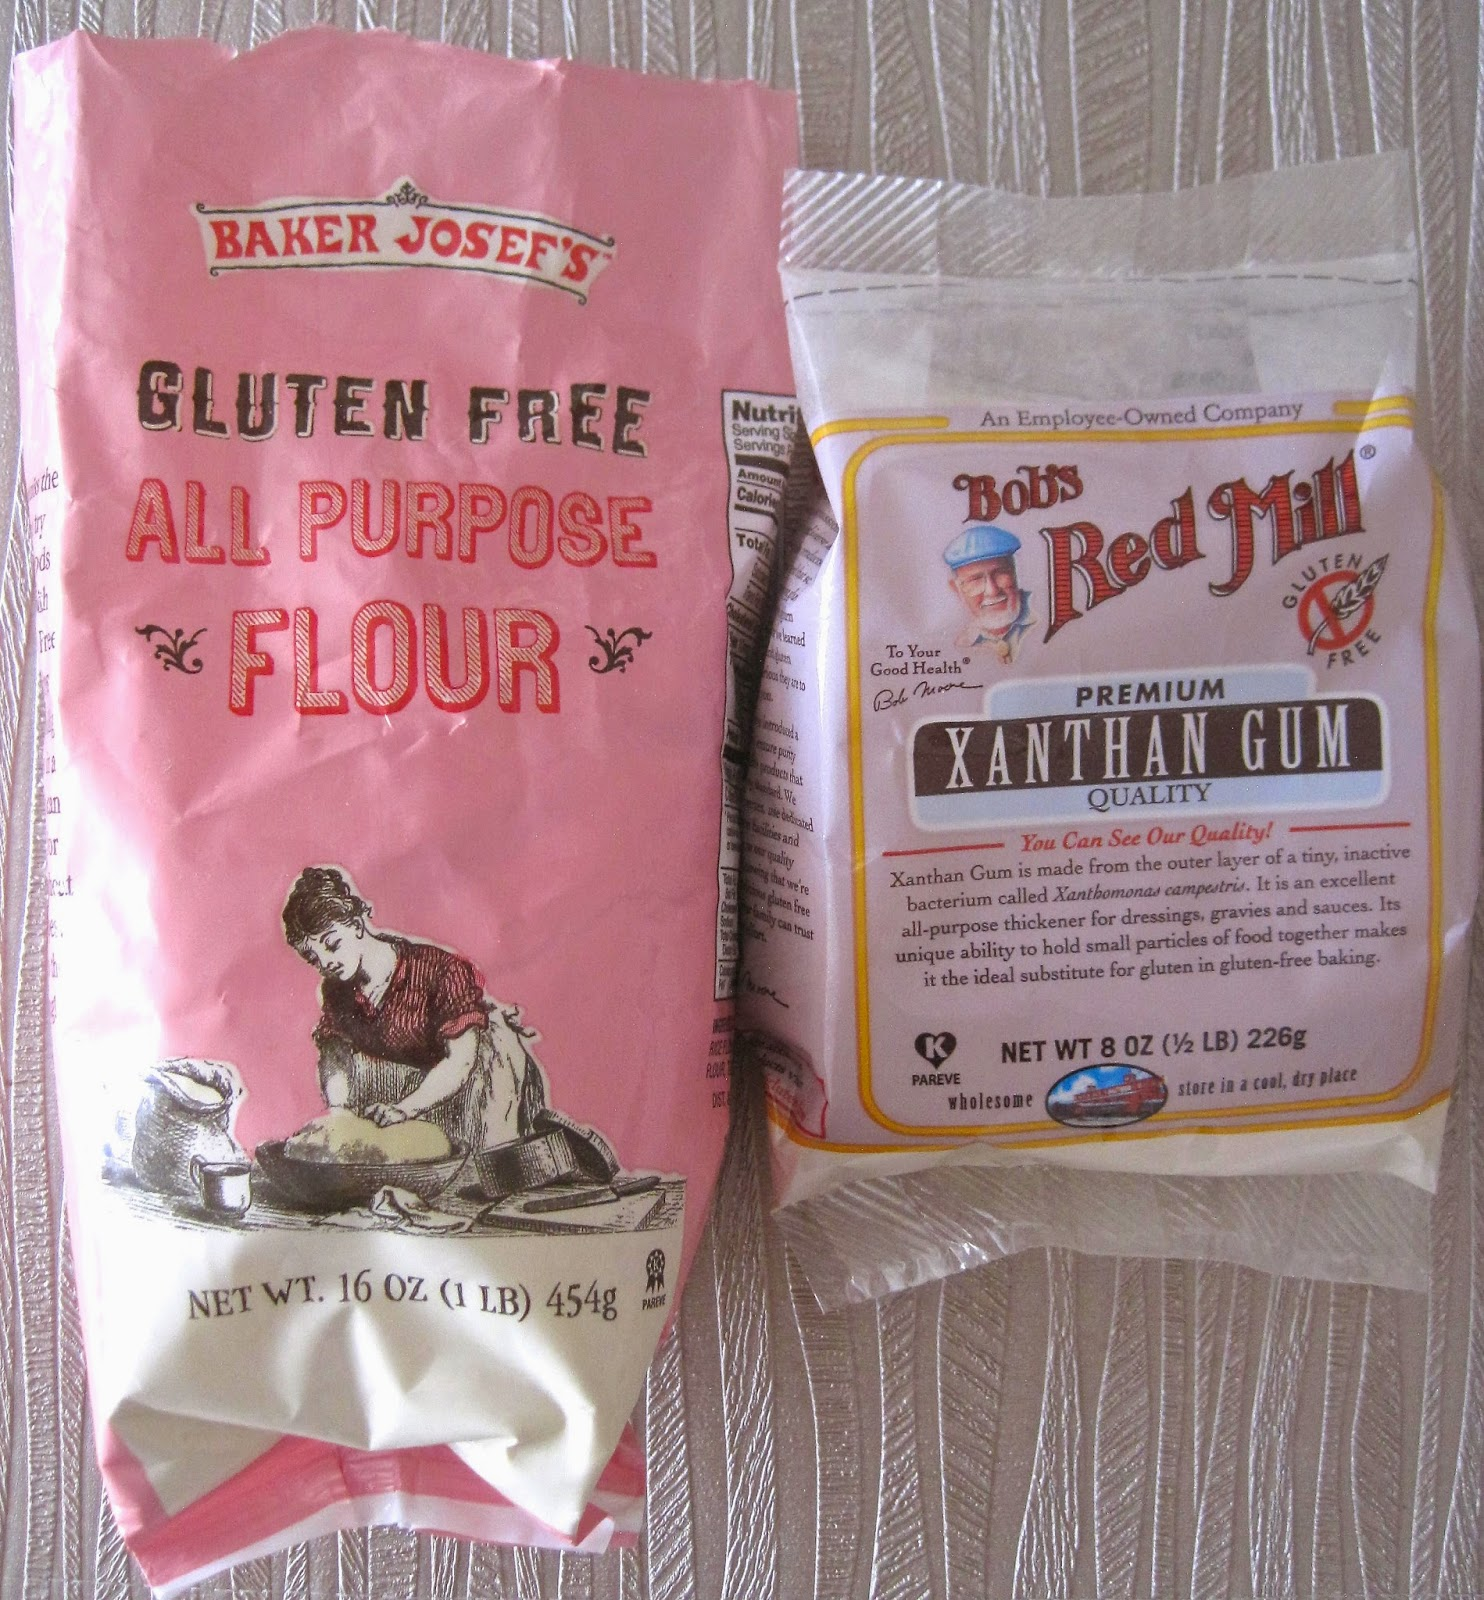 Trader Joe's Gluten-Free All Purpose Flour & Bob's Red Mill Xanthan Gum